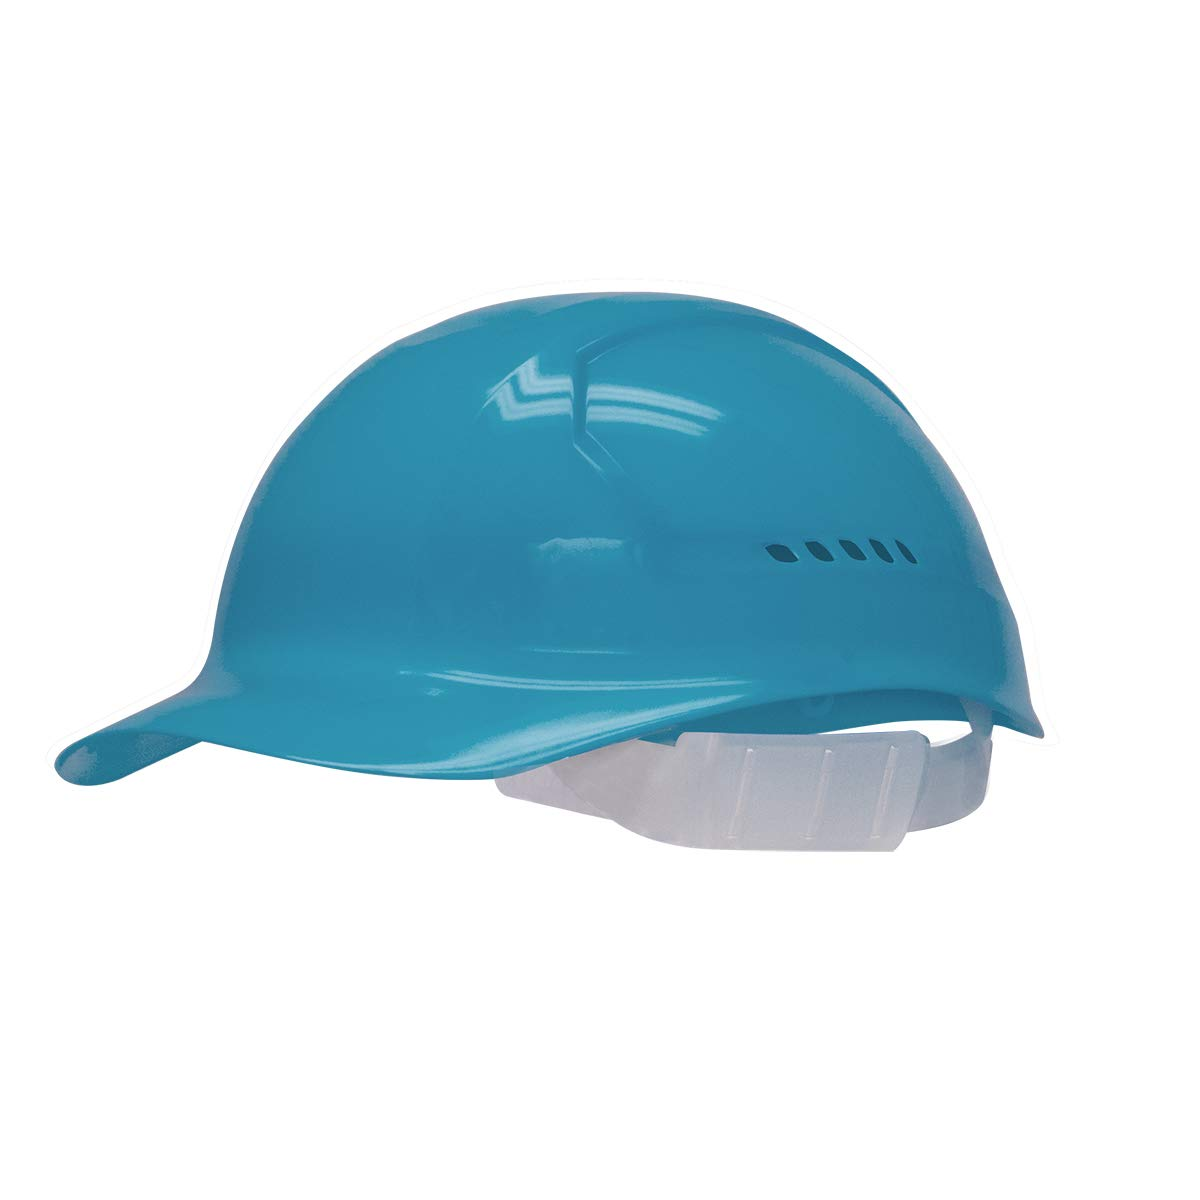 Bullard Slate Blue HDPE Cap Style Bump Cap With Slidelock Suspension And Vinyl Browpad - Pack of 25